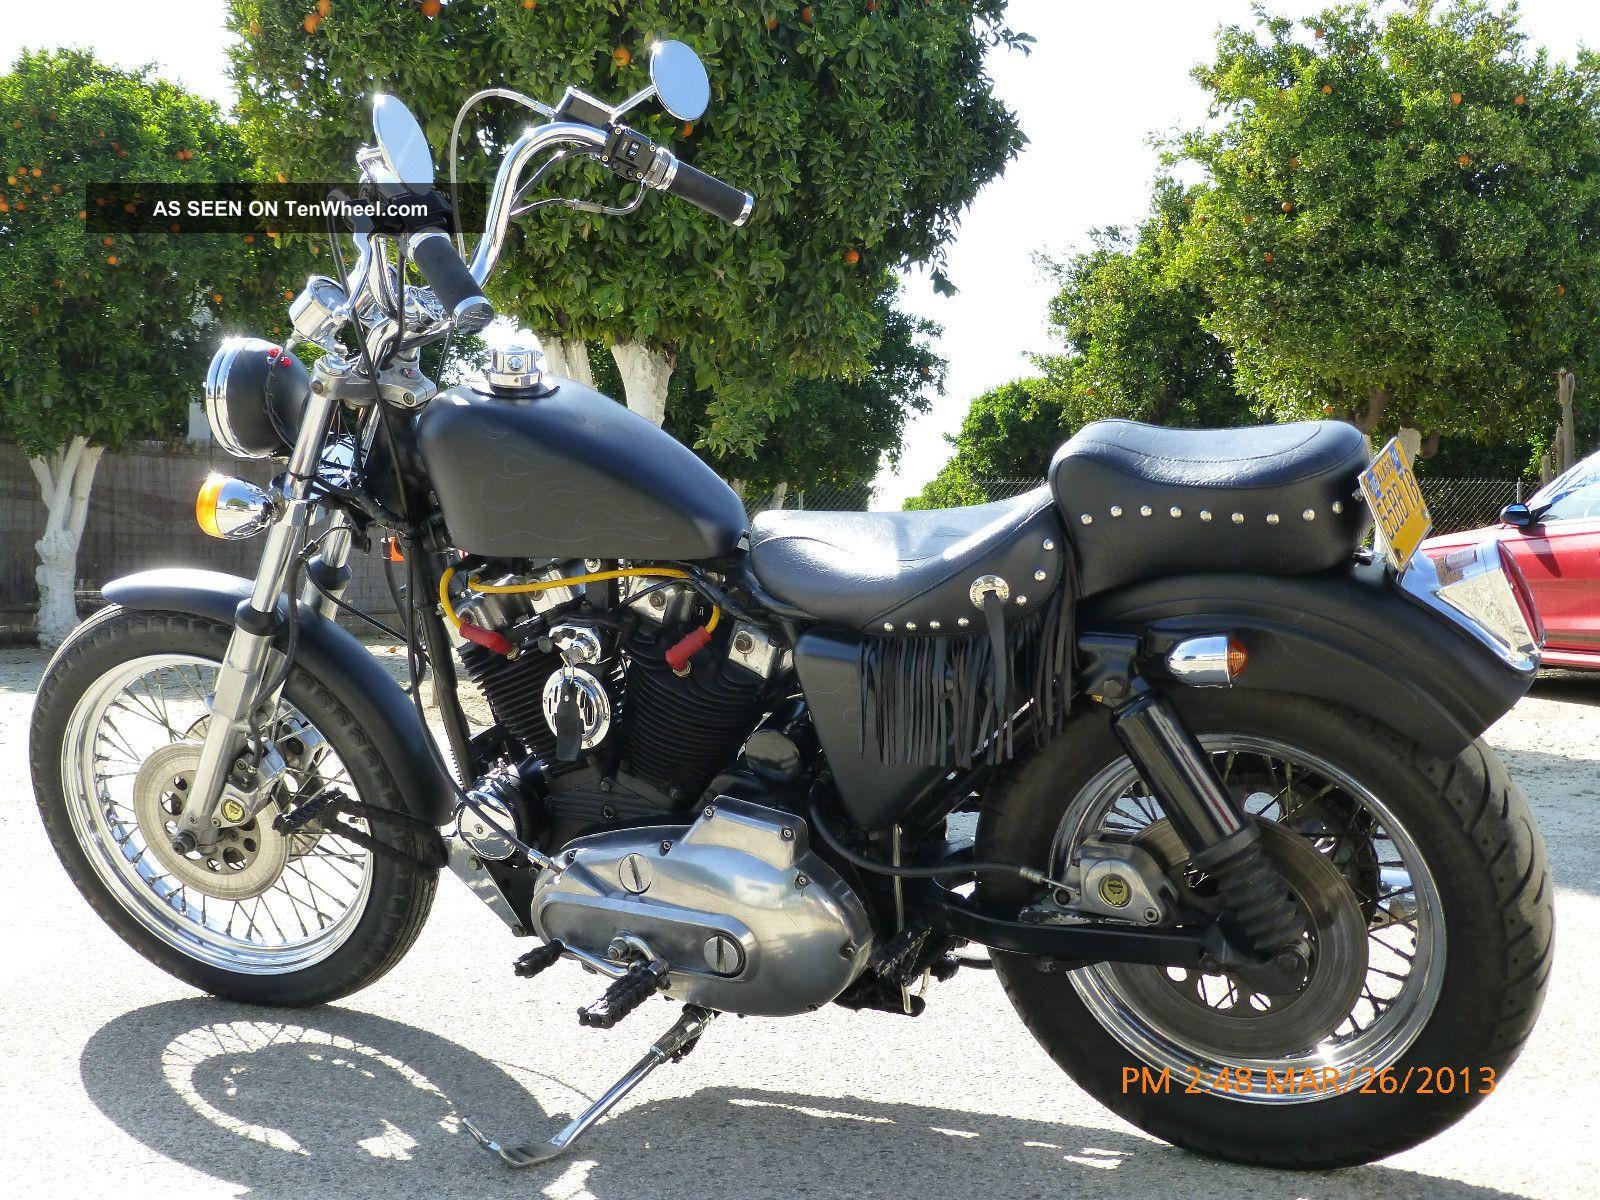 1979 Harley Davidson Ironhead Sportster Sportster photo